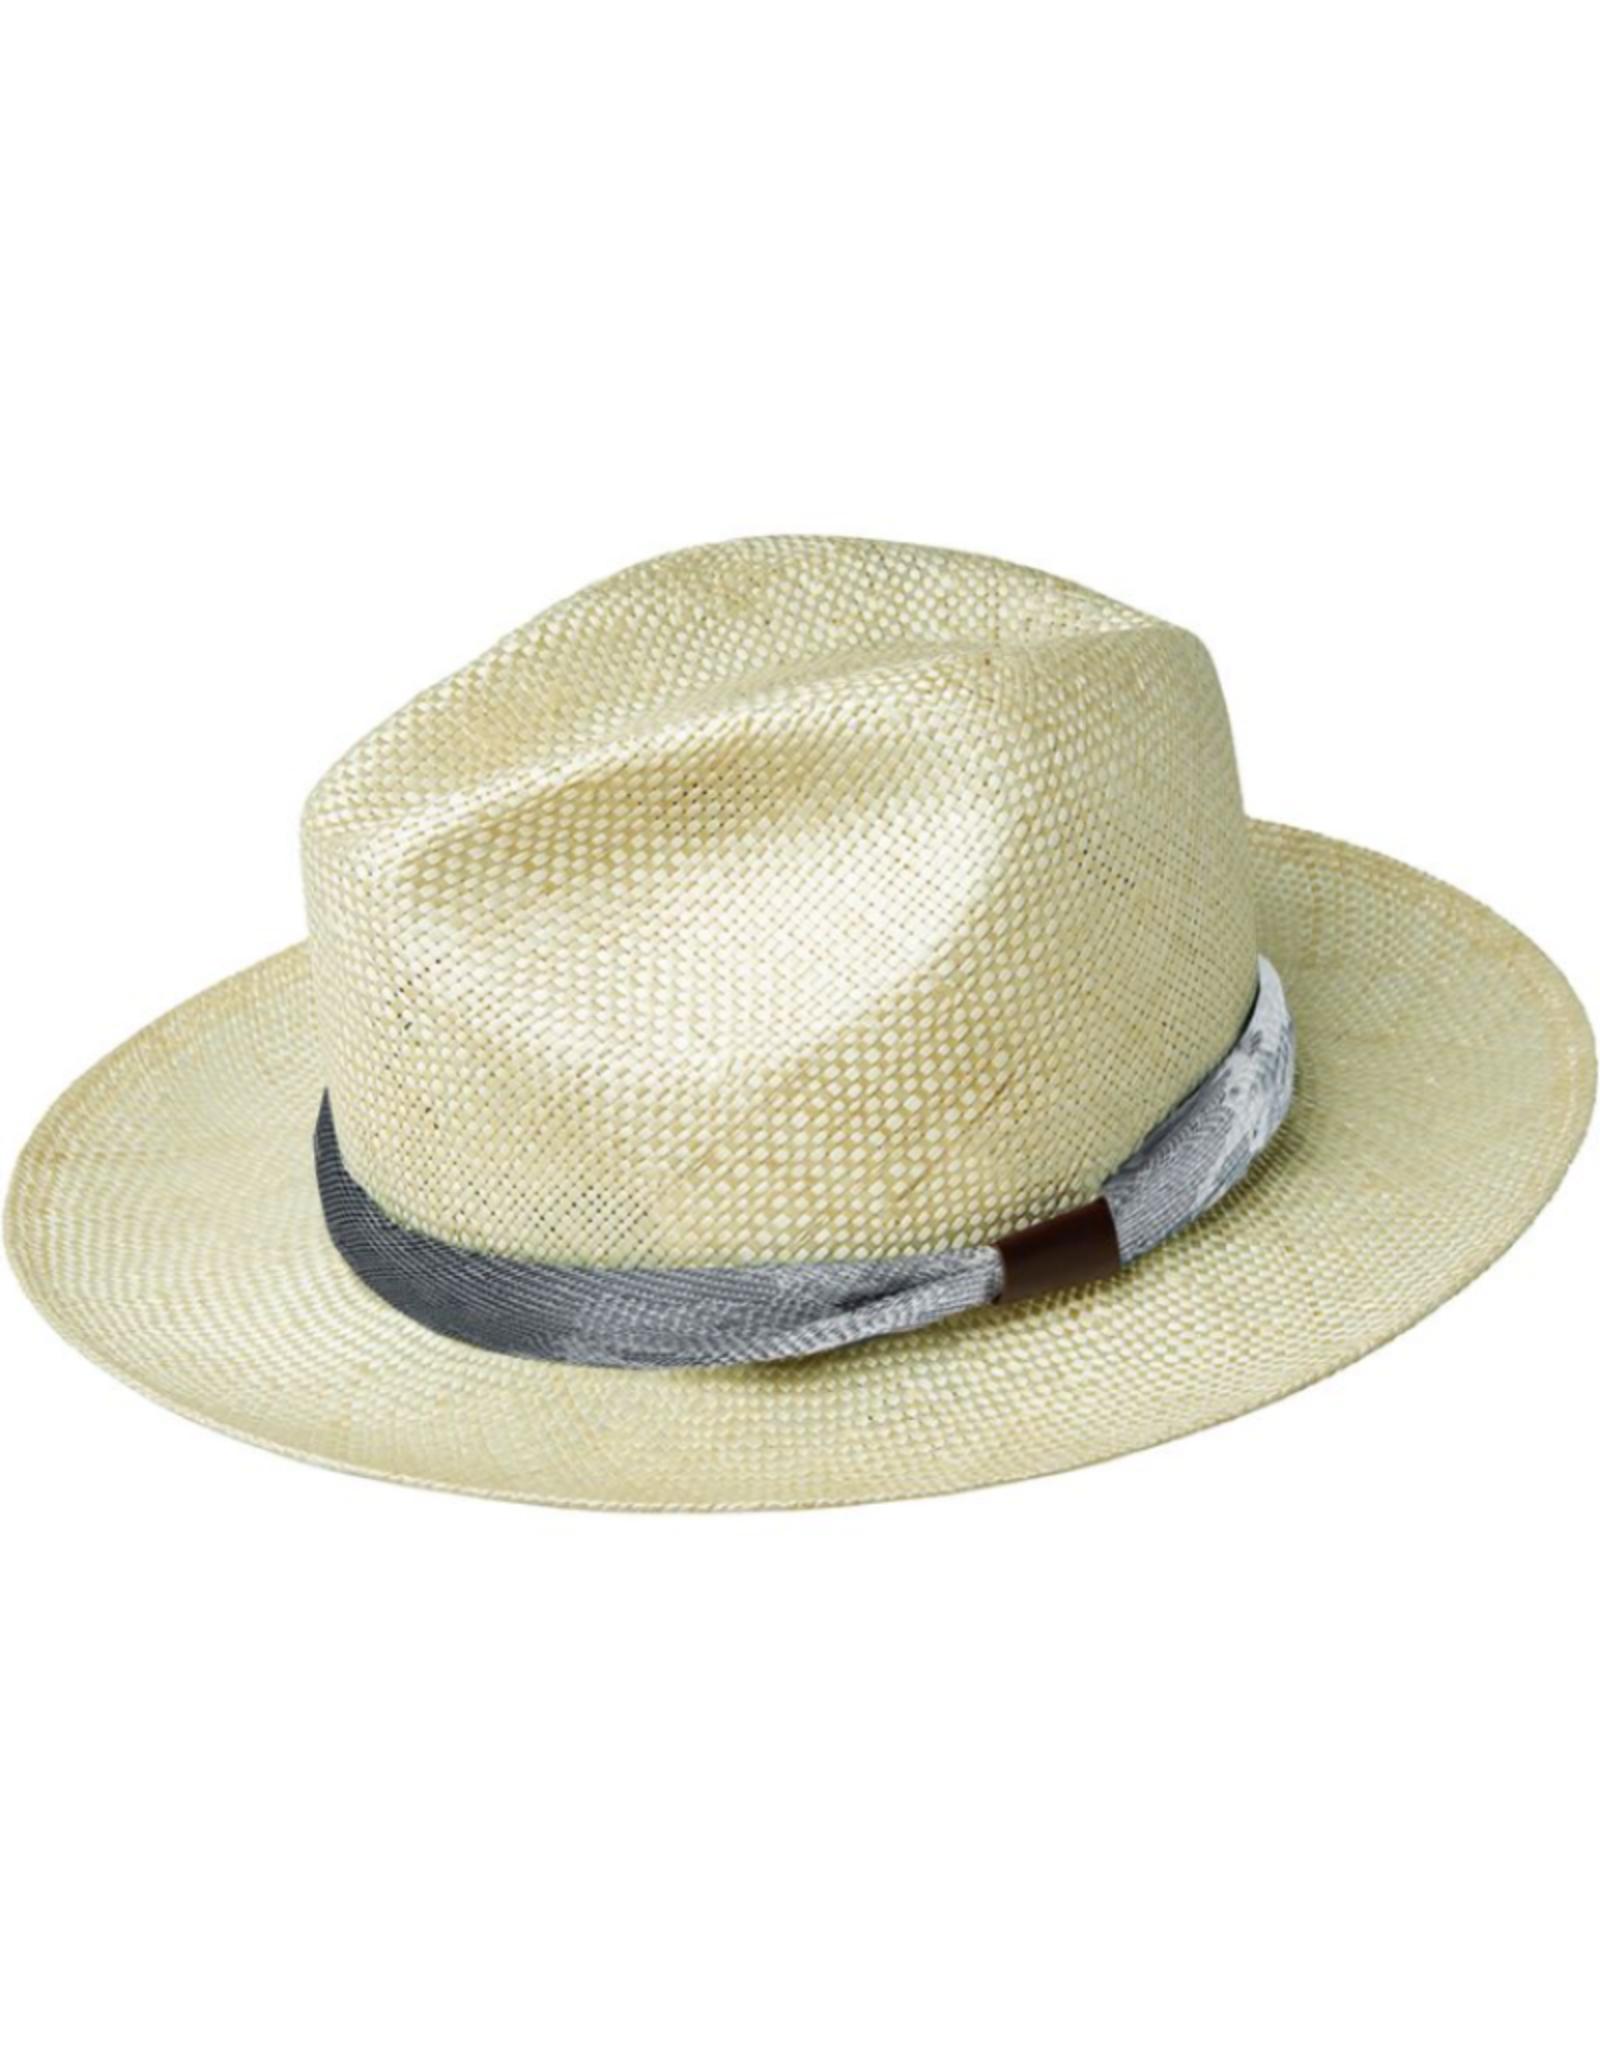 "Bailey Hat Co. HAT-FEDORA MED BRIM ""BRETEN"", SISAL W BAND"